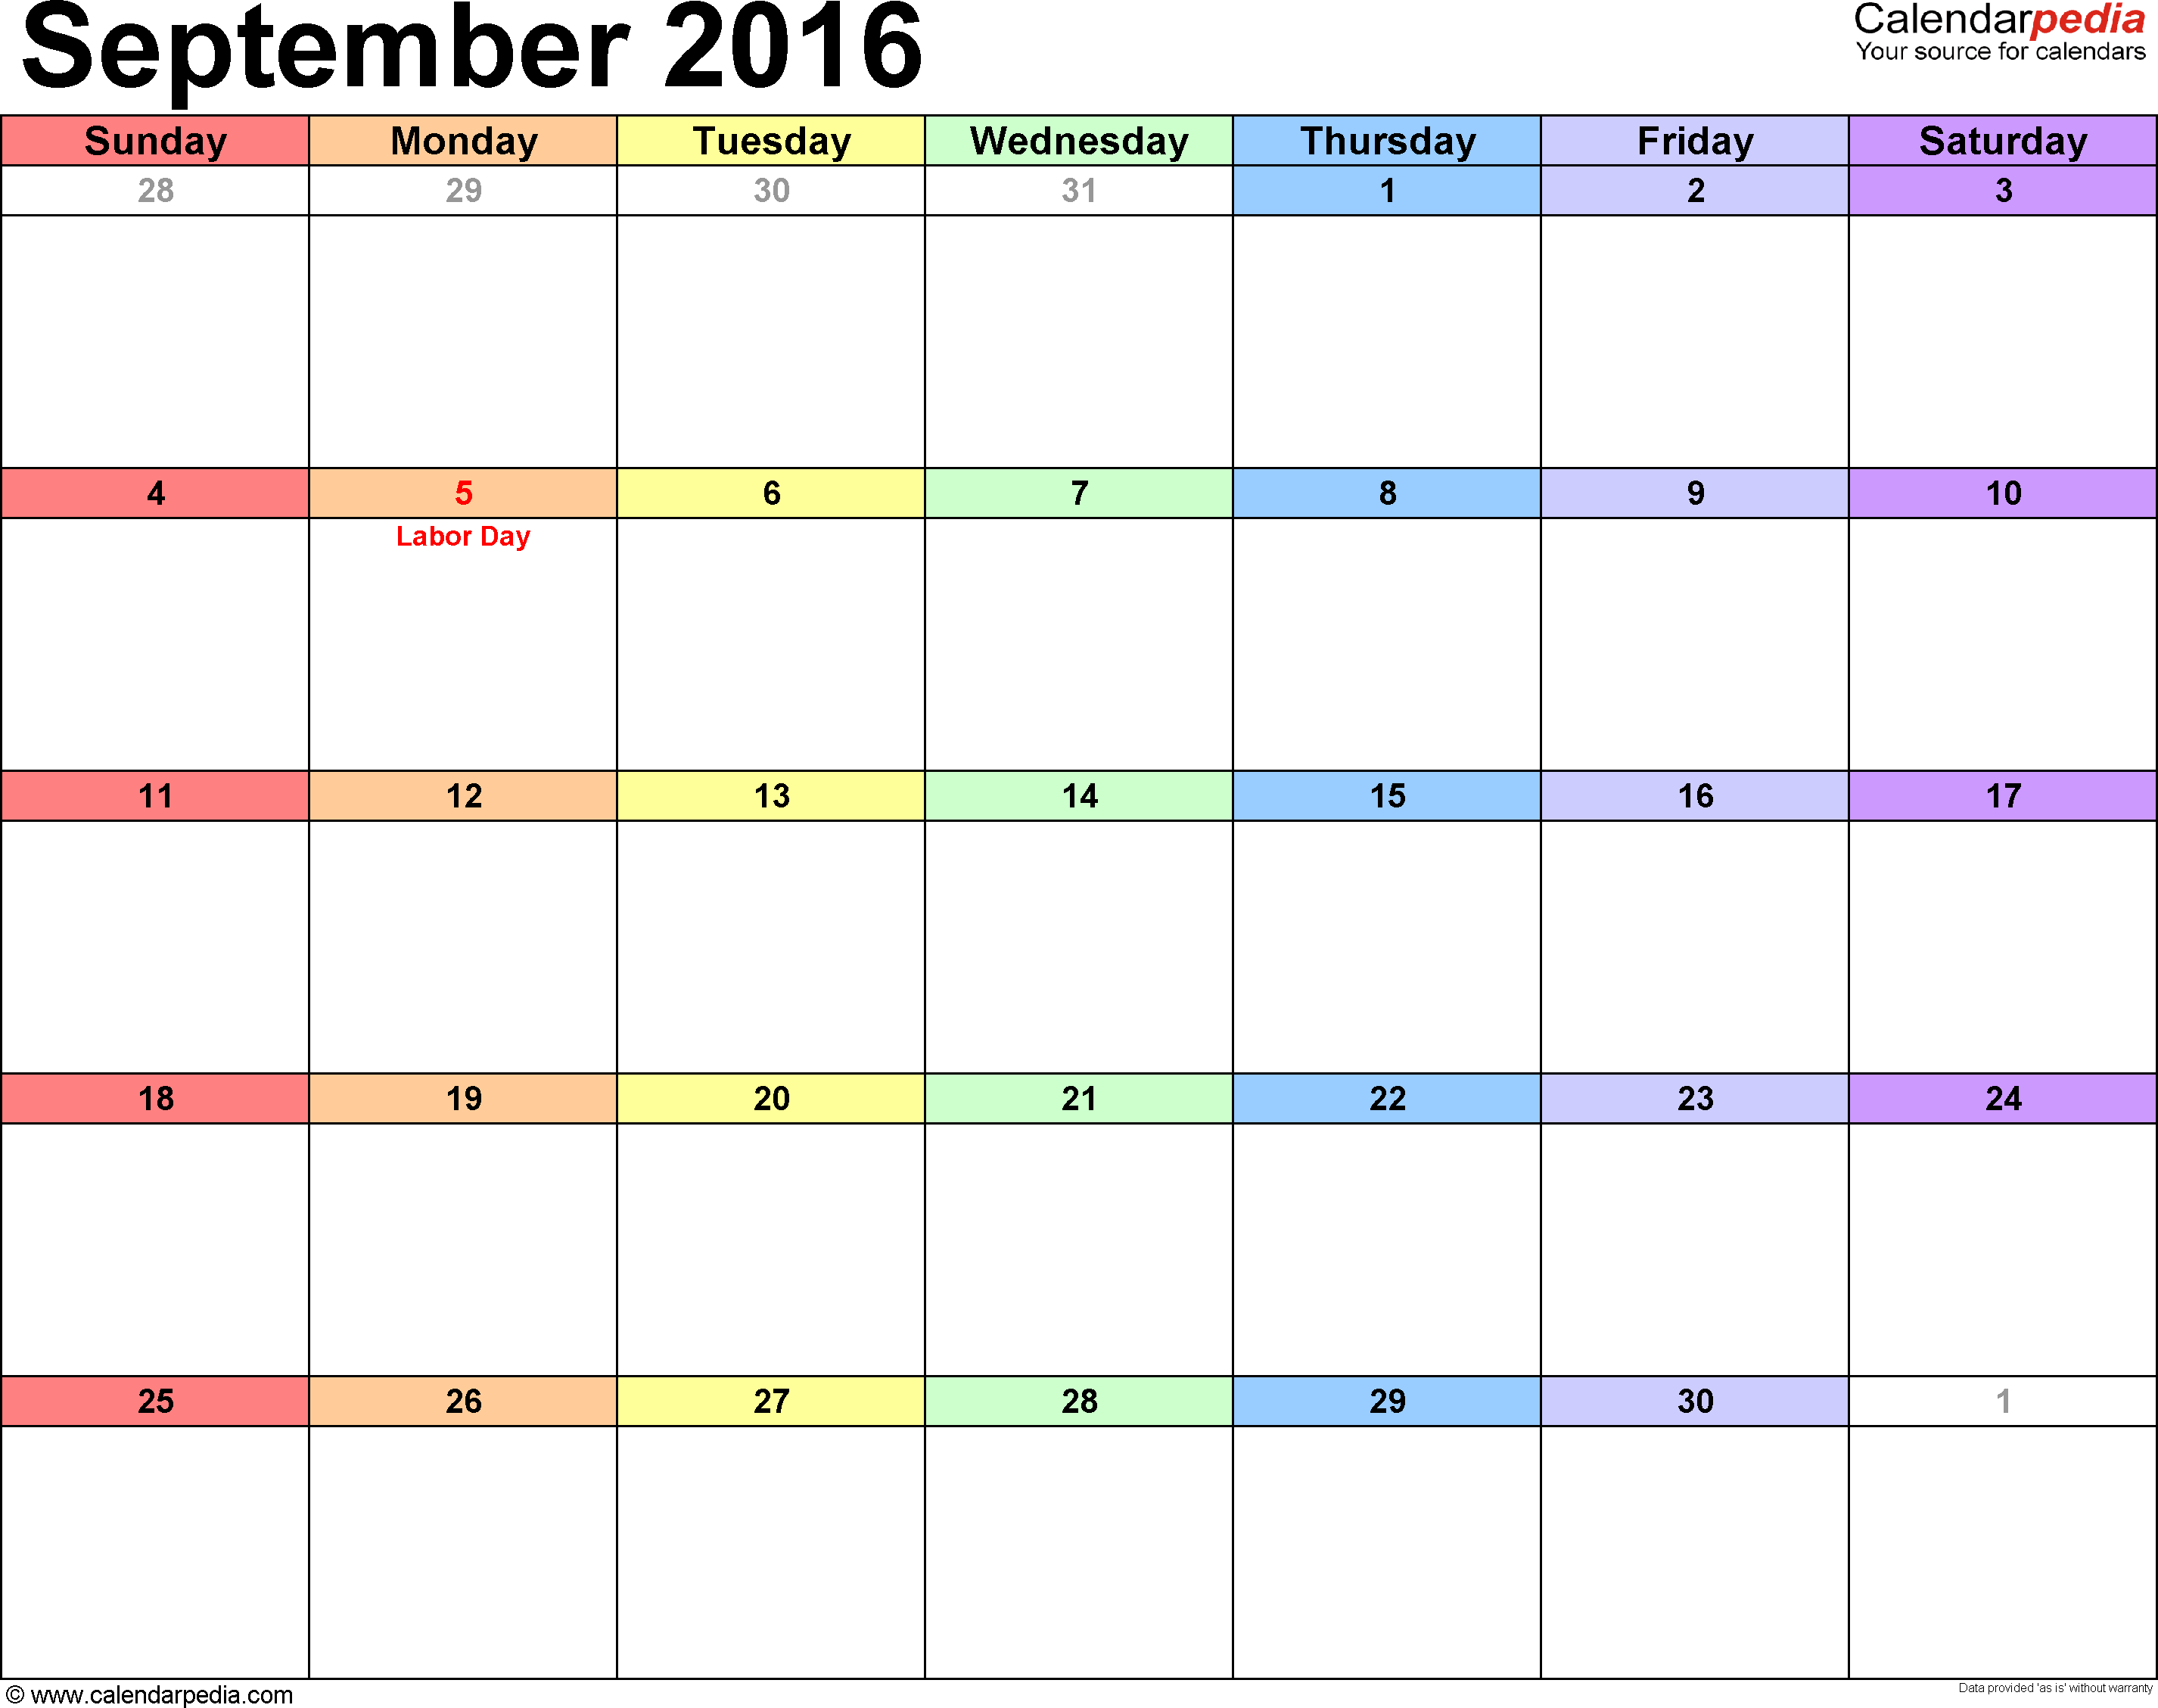 September 2016 calendar, landscape orientation, 'rainbow calendar', available as printable templates for Word, Excel and PDF